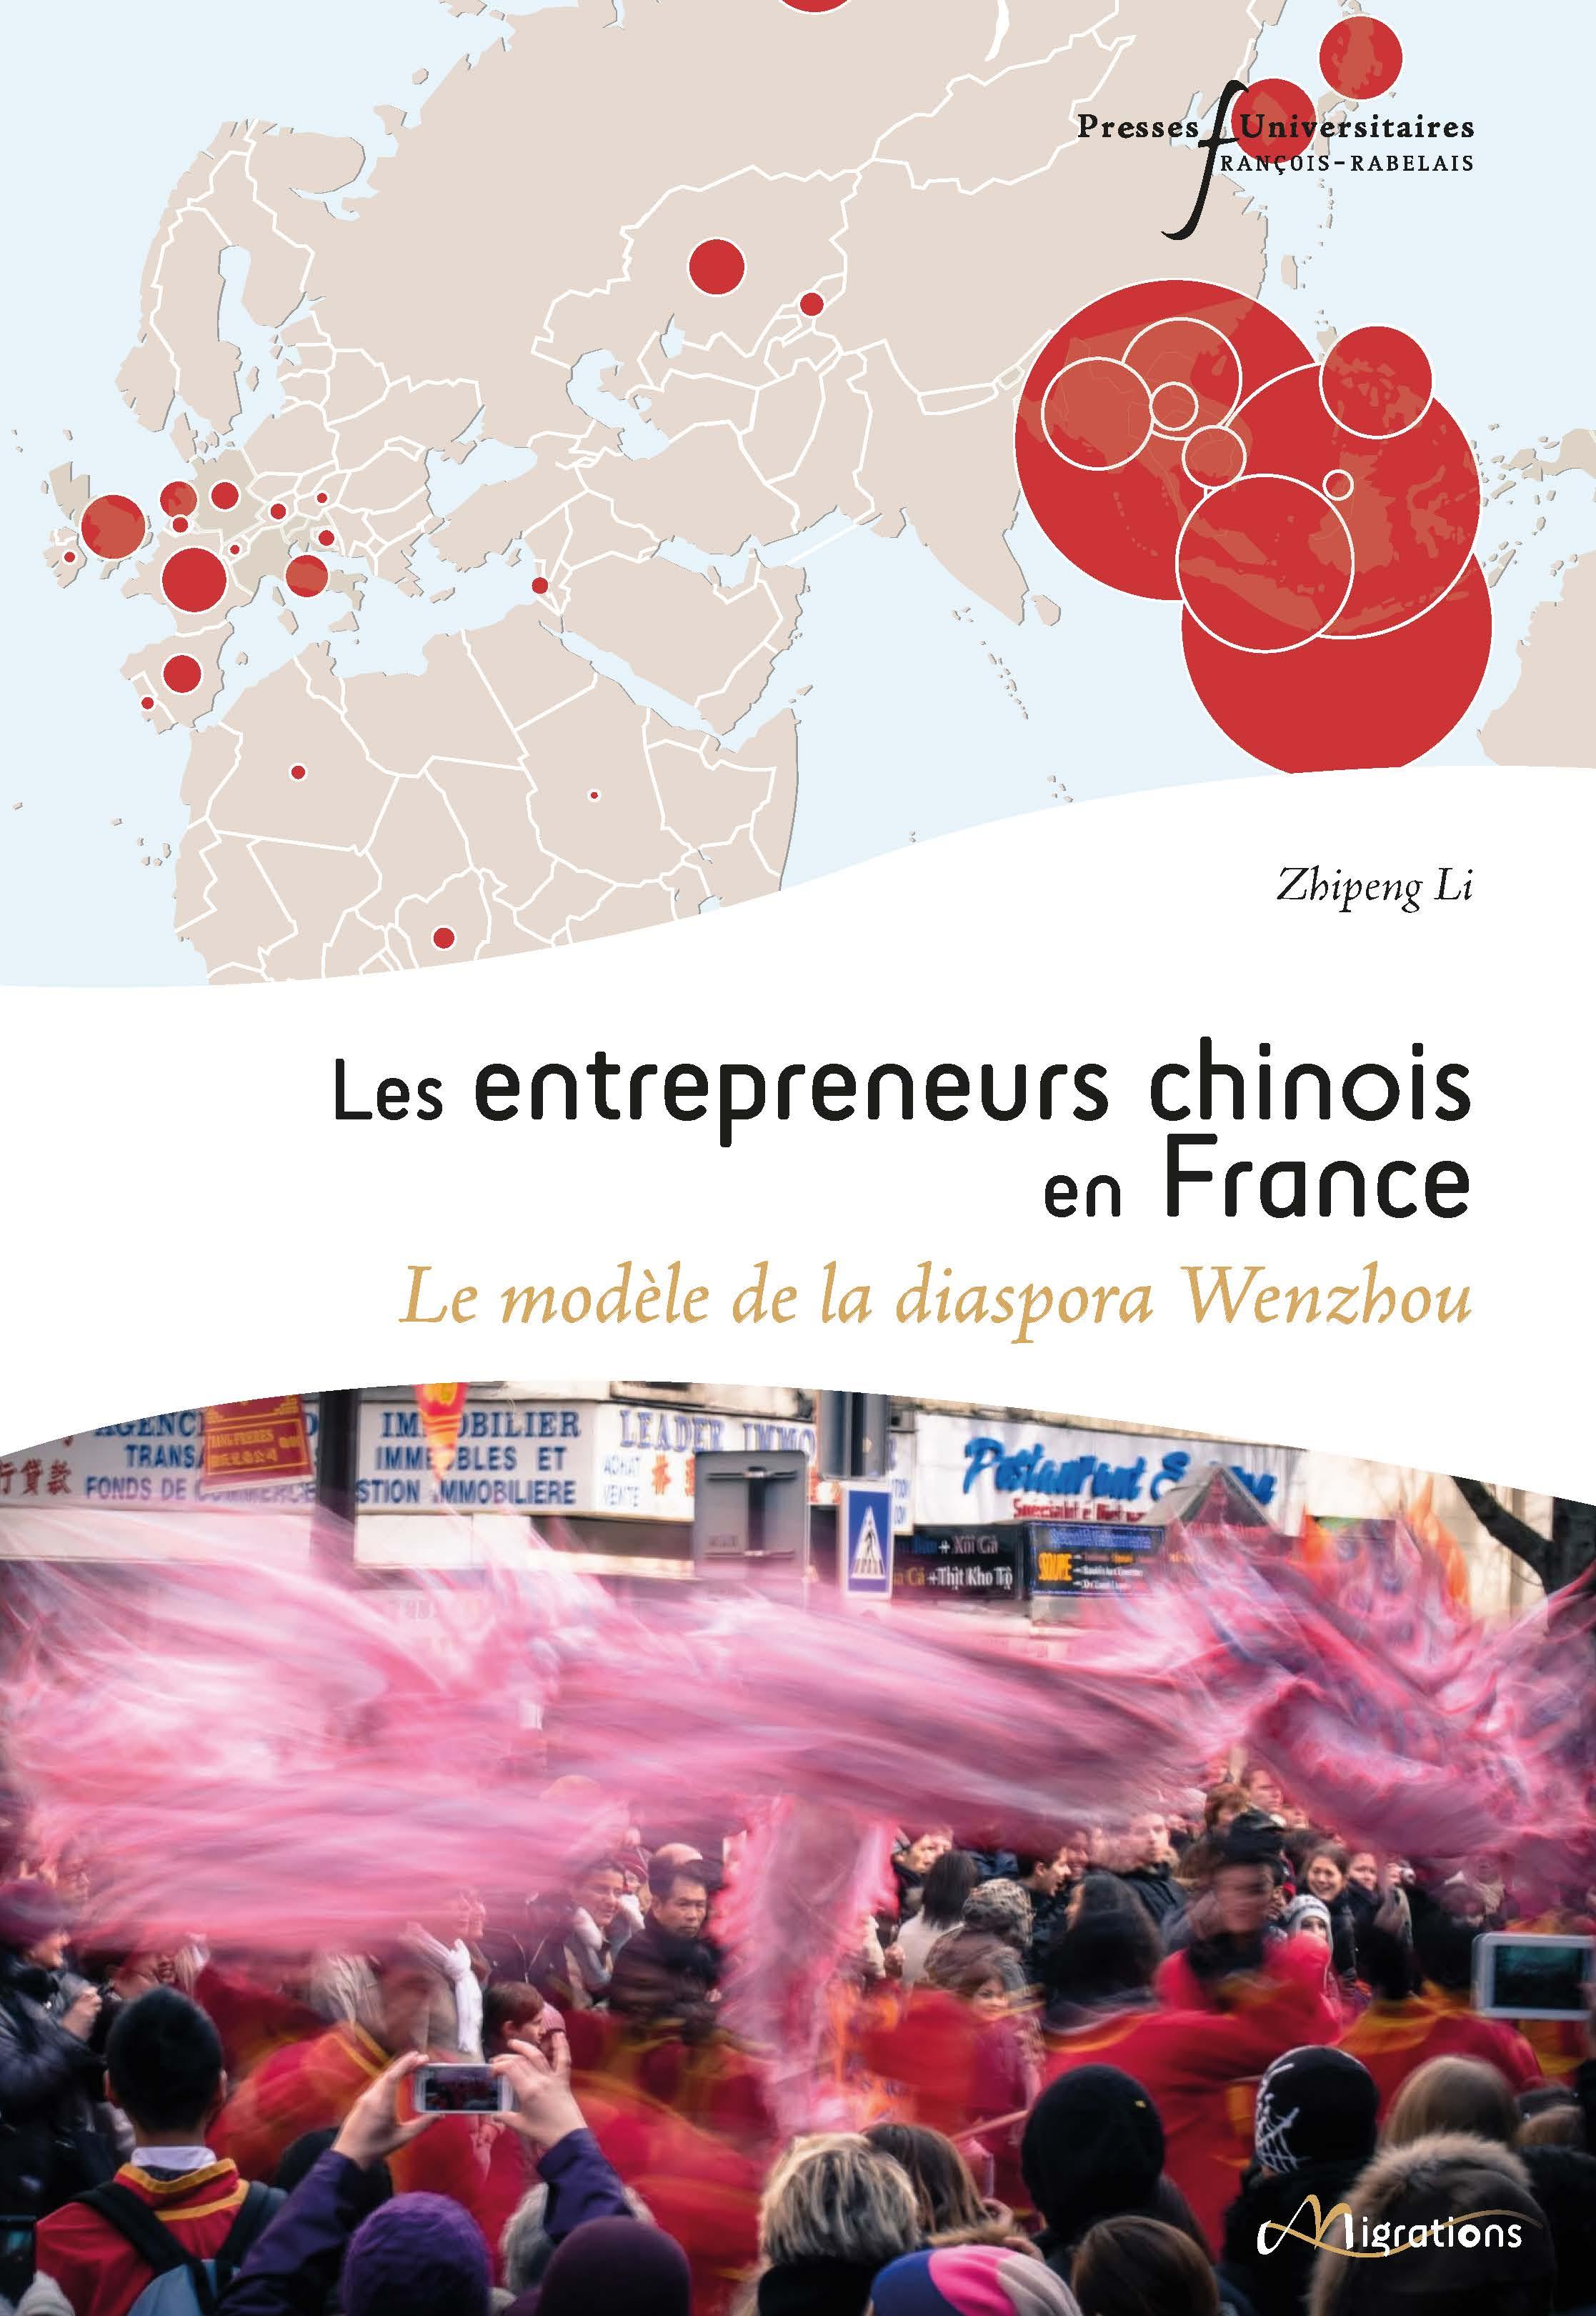 Les entrepreneurs chinois en France